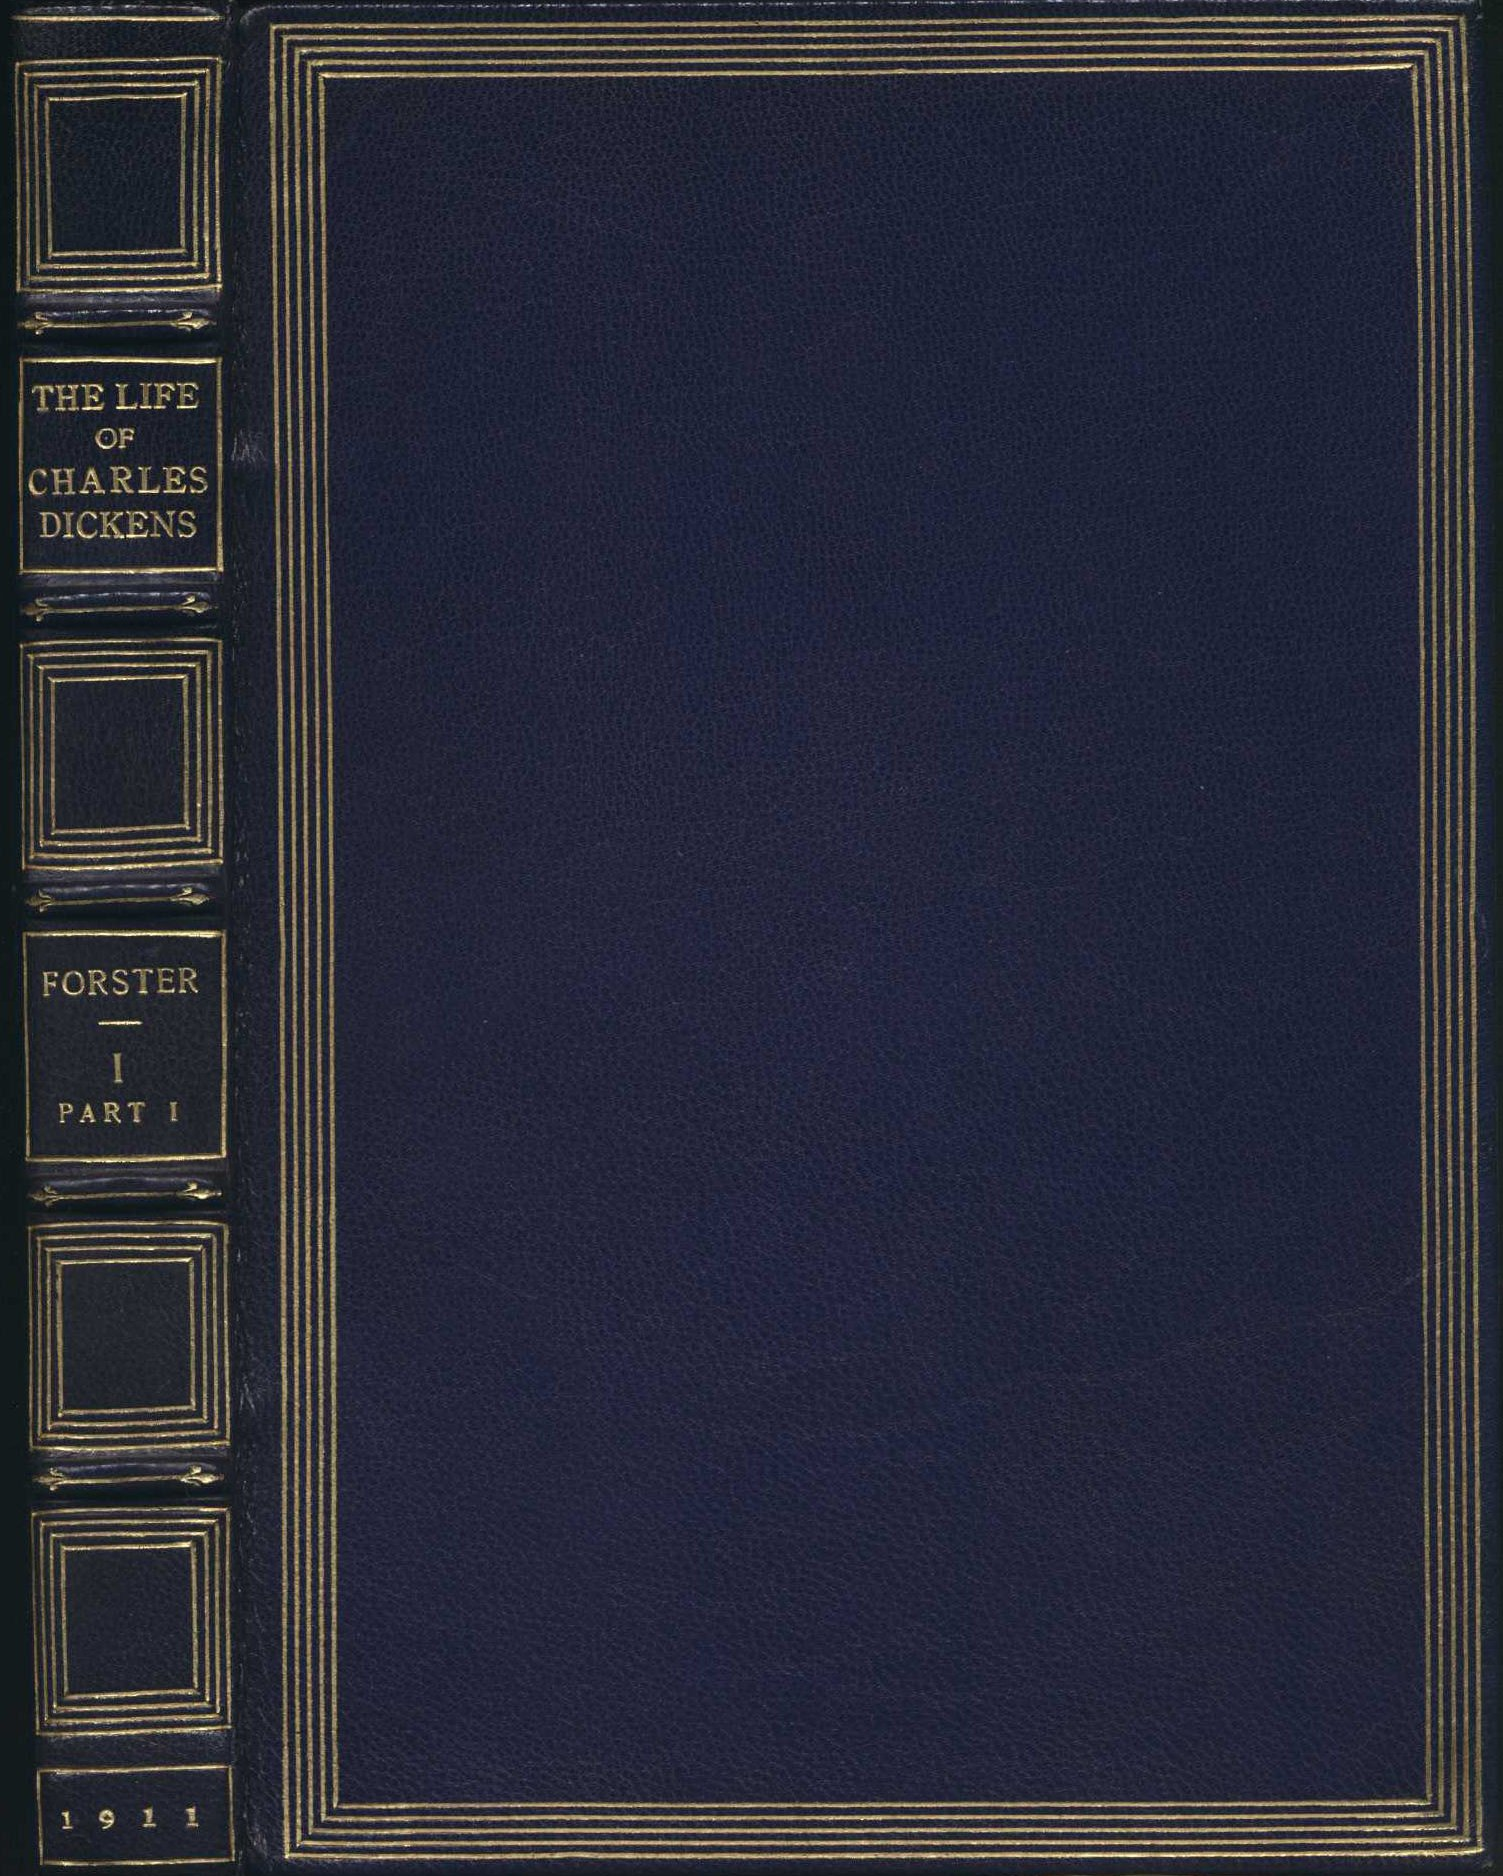 John Forster. The life of Charles Dickens. New York: Baker & Taylor, 1911.